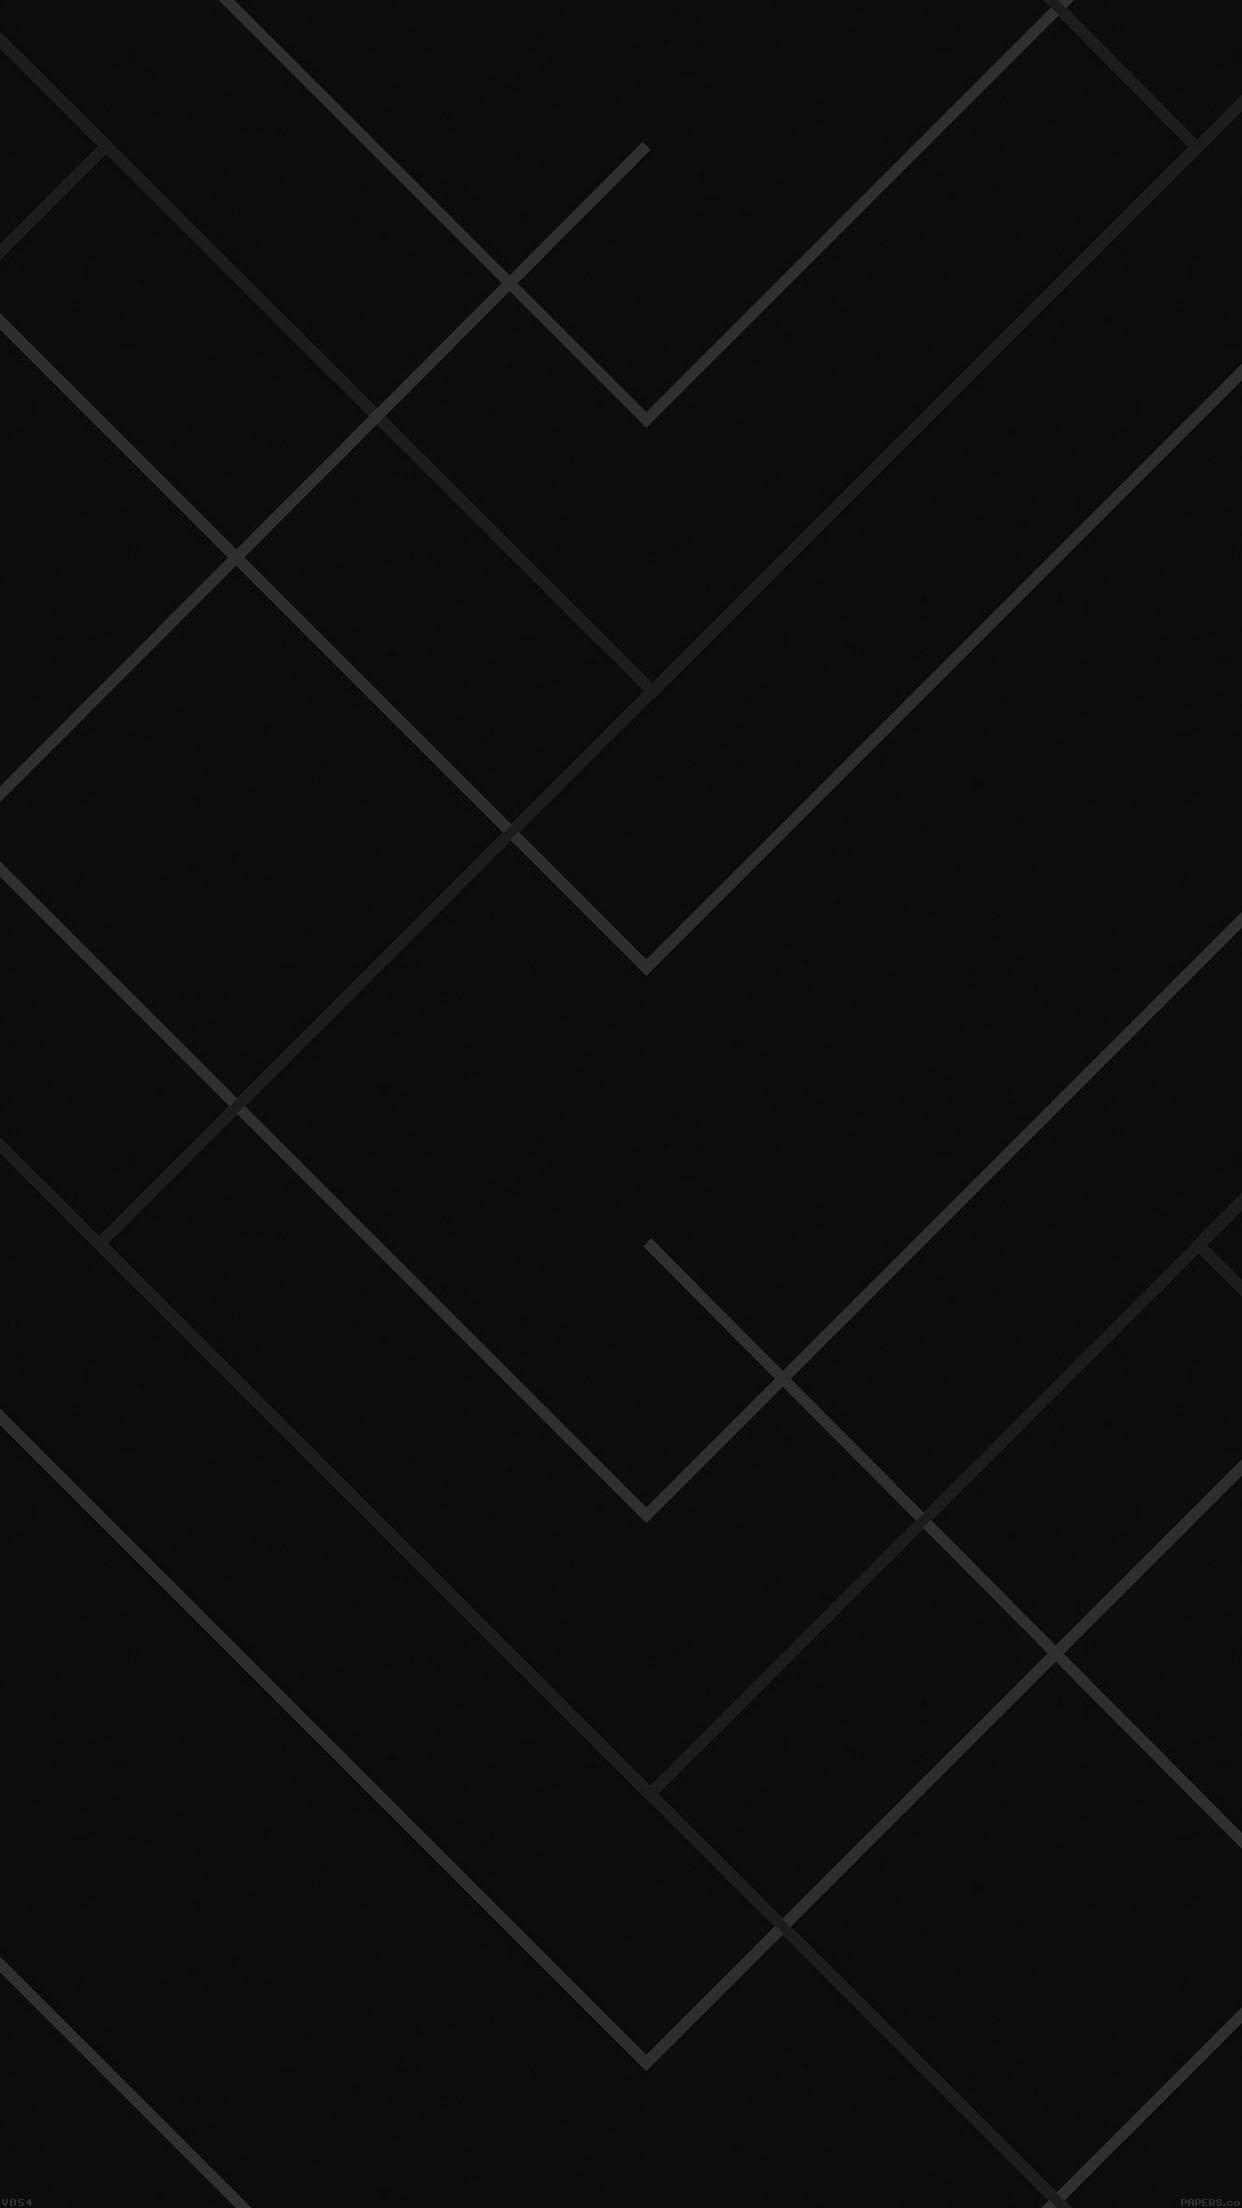 dark-wallpaper-applifevn-3